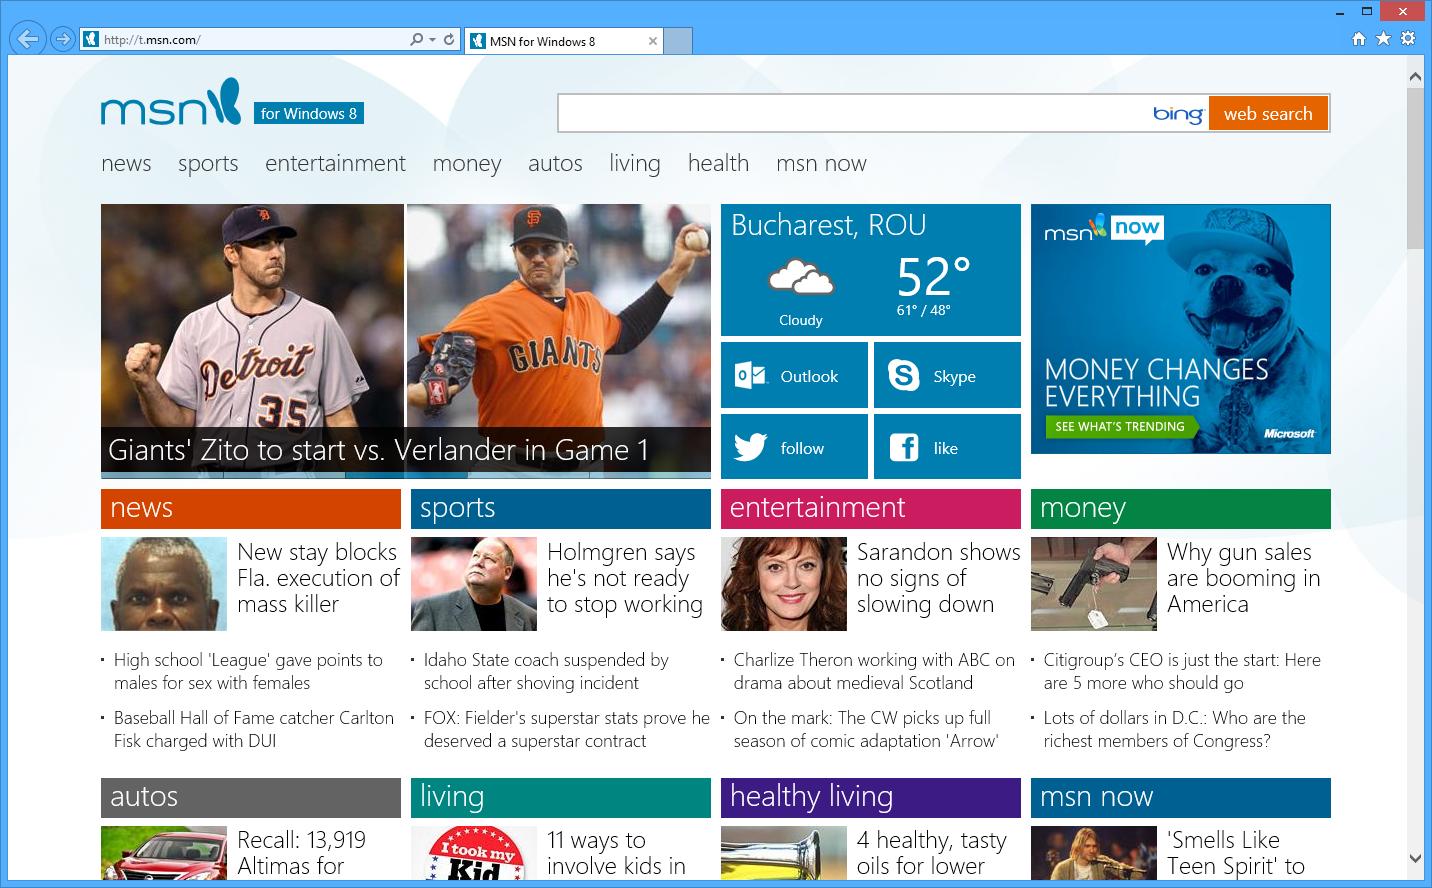 microsoft launches windows 8 inspired msn website